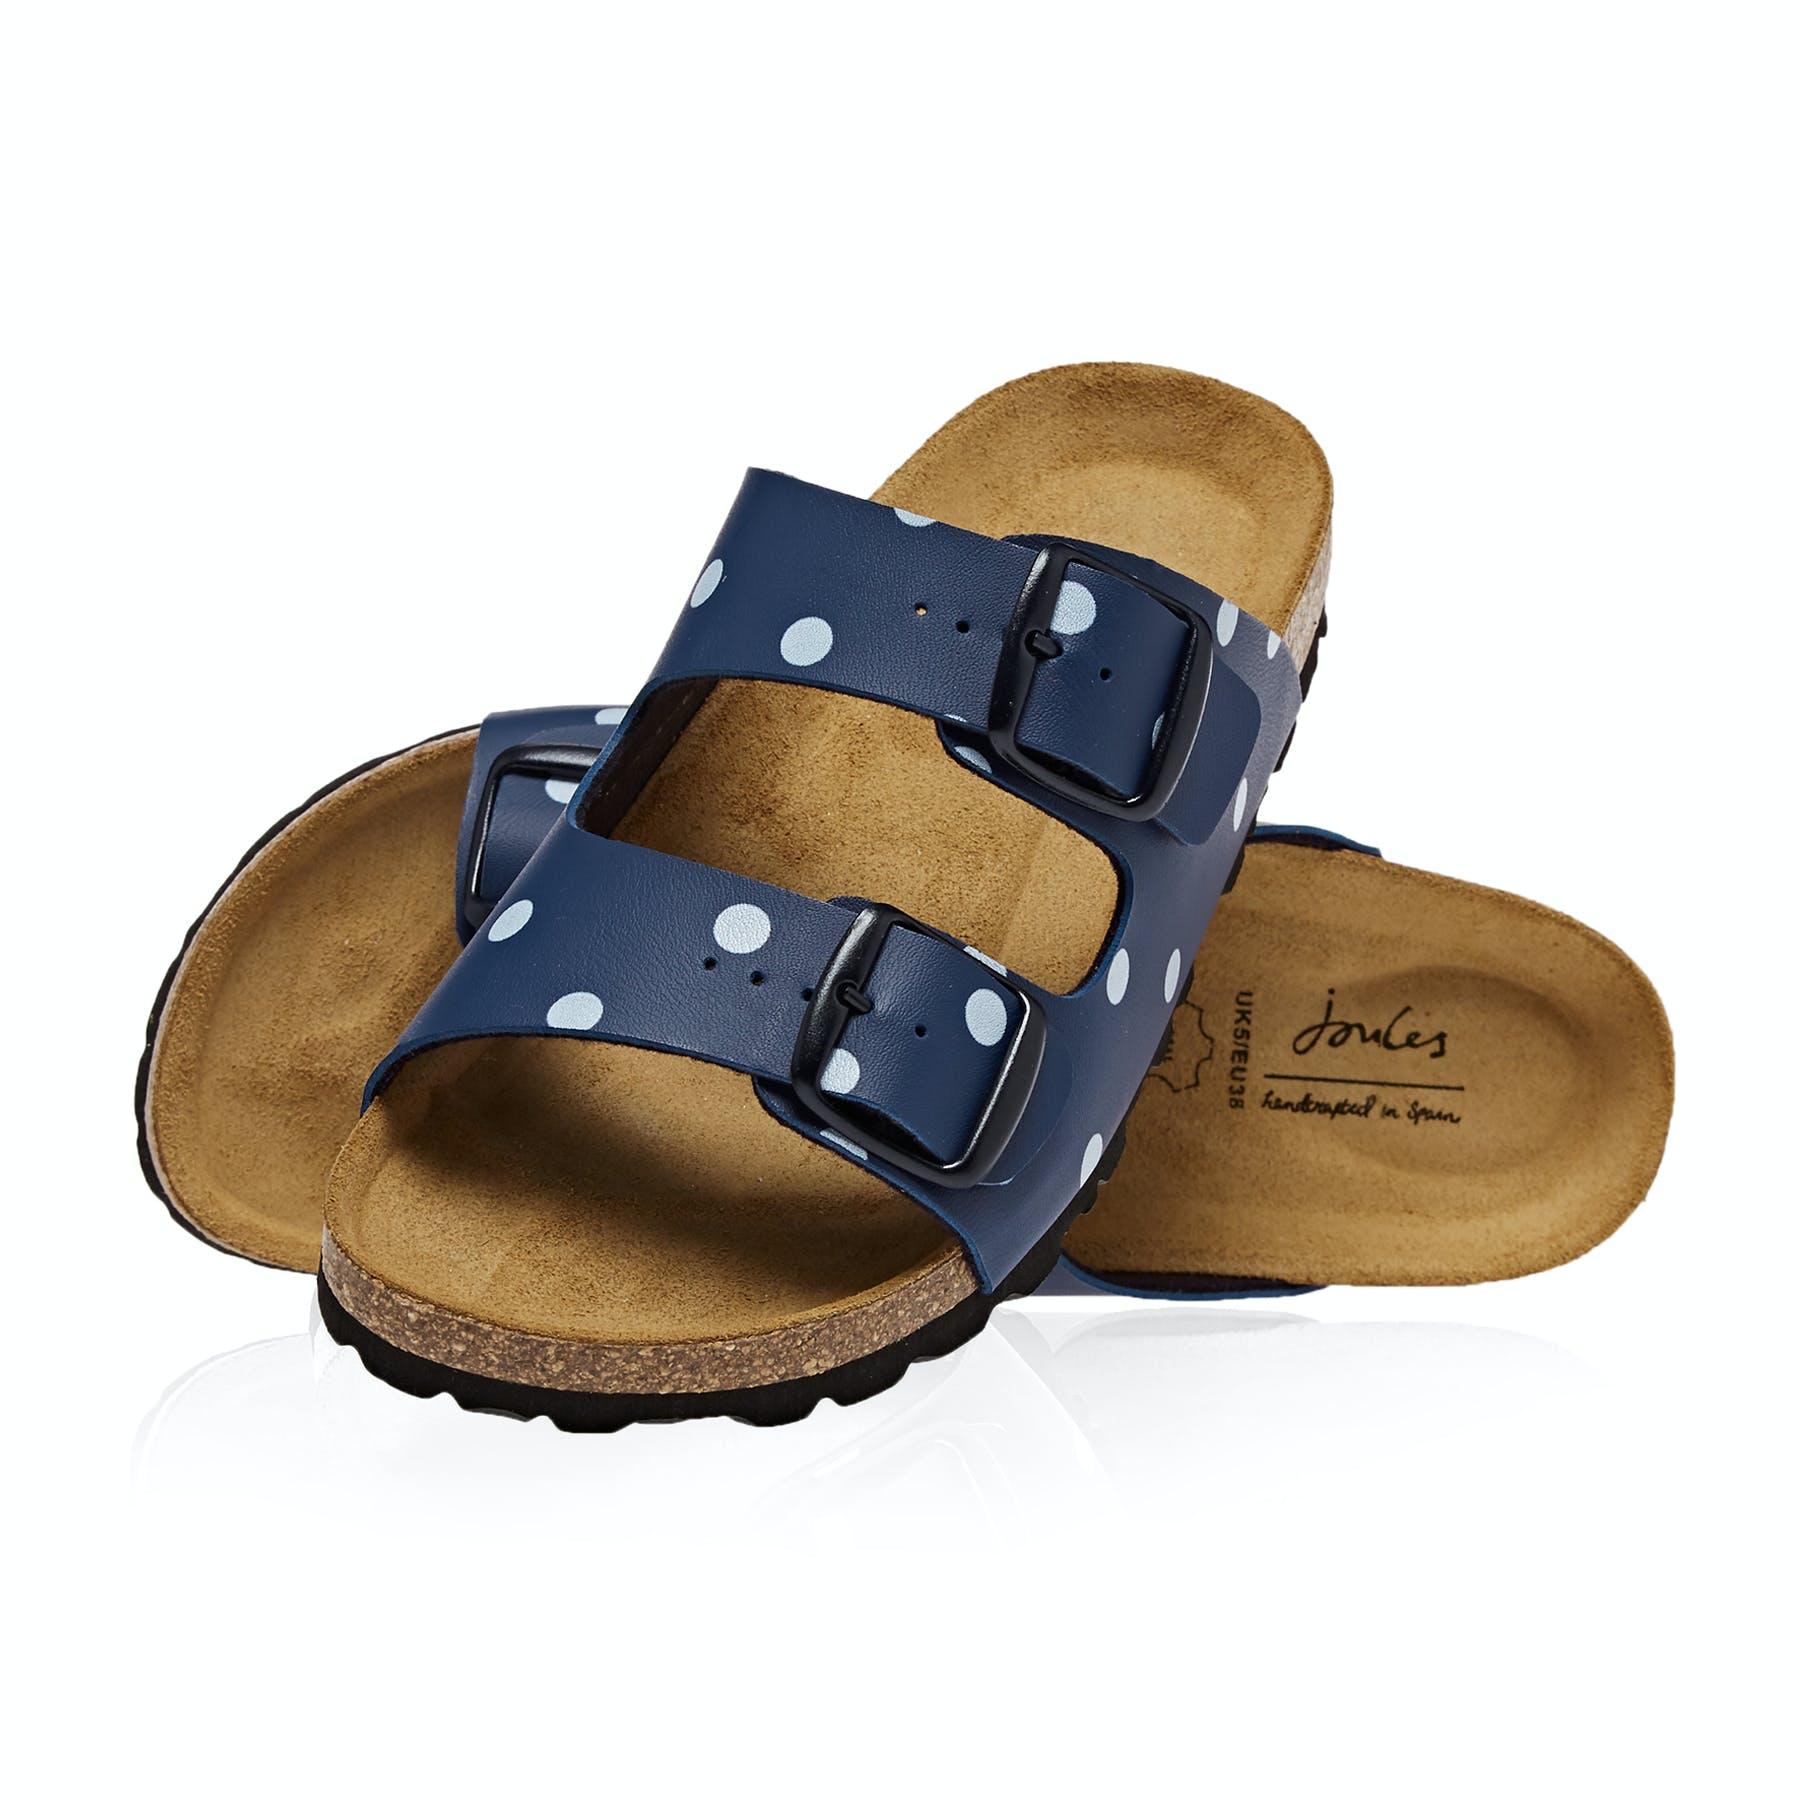 Joules Womens Penley Printed Slider Sandal in DARK BLUE SPOT